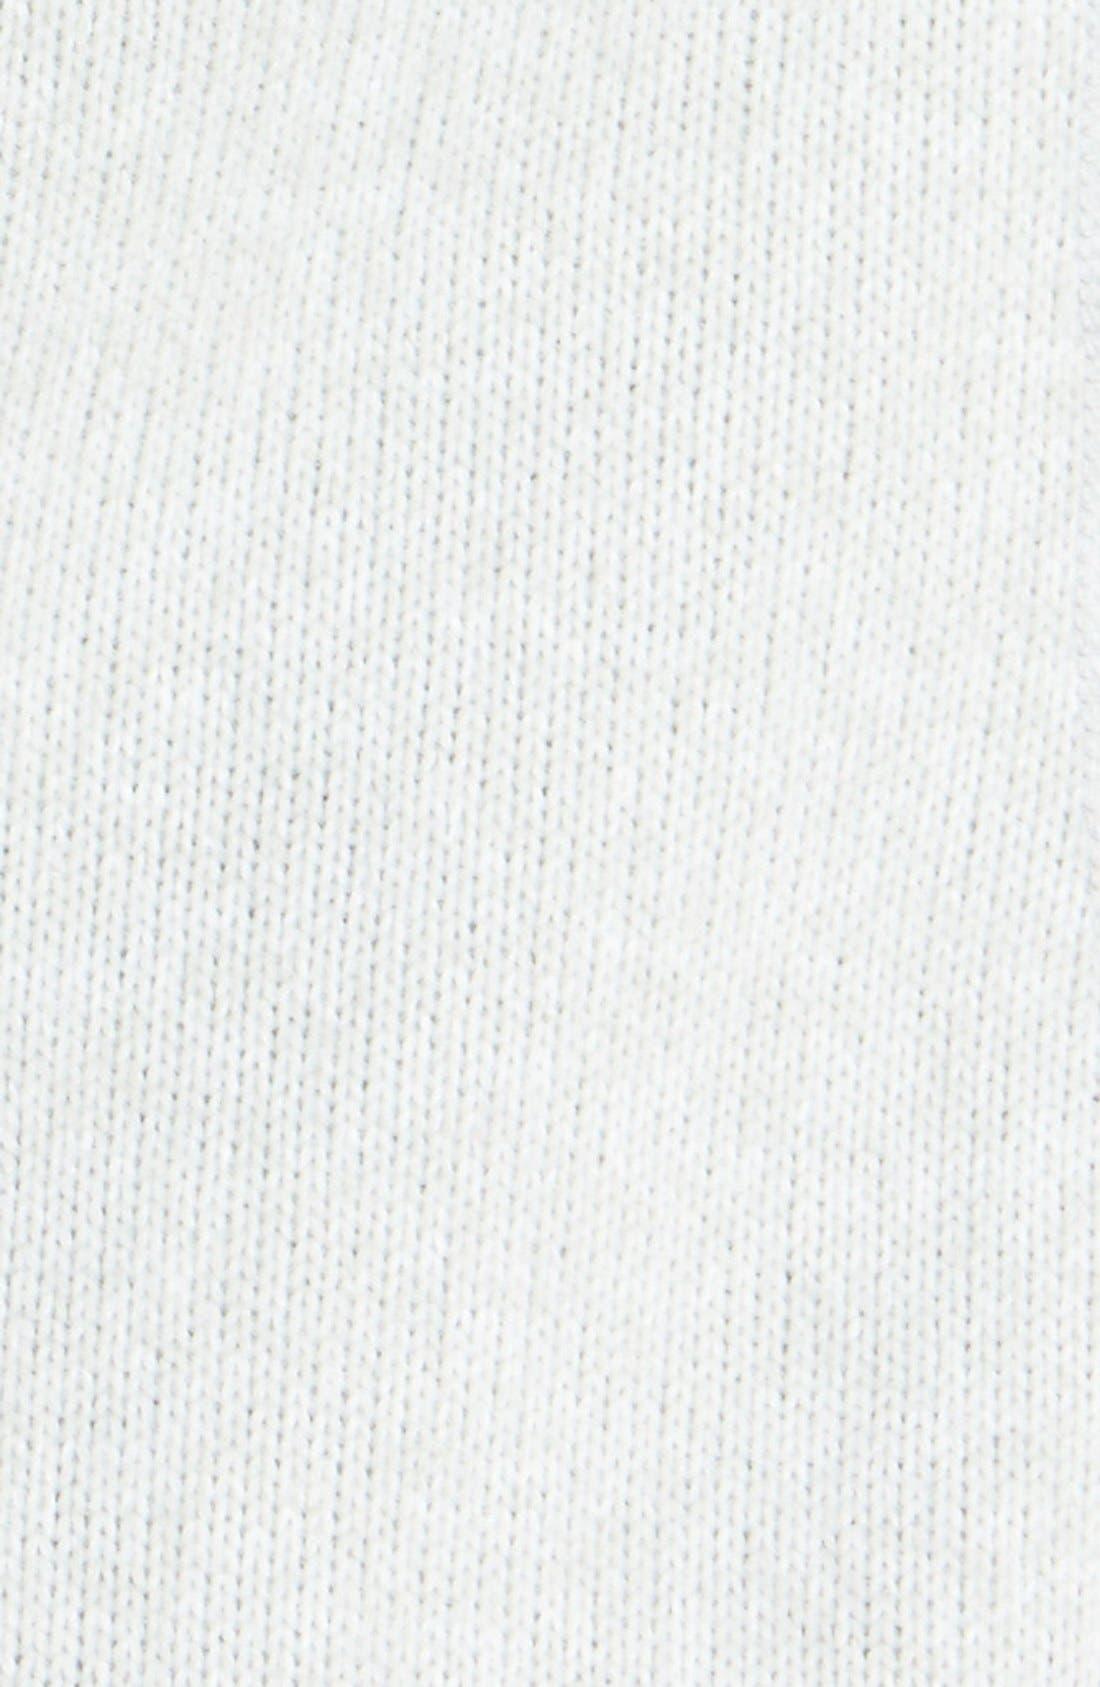 Alternate Image 3  - Arc'teryx Covert Cardigan Fleece Jacket